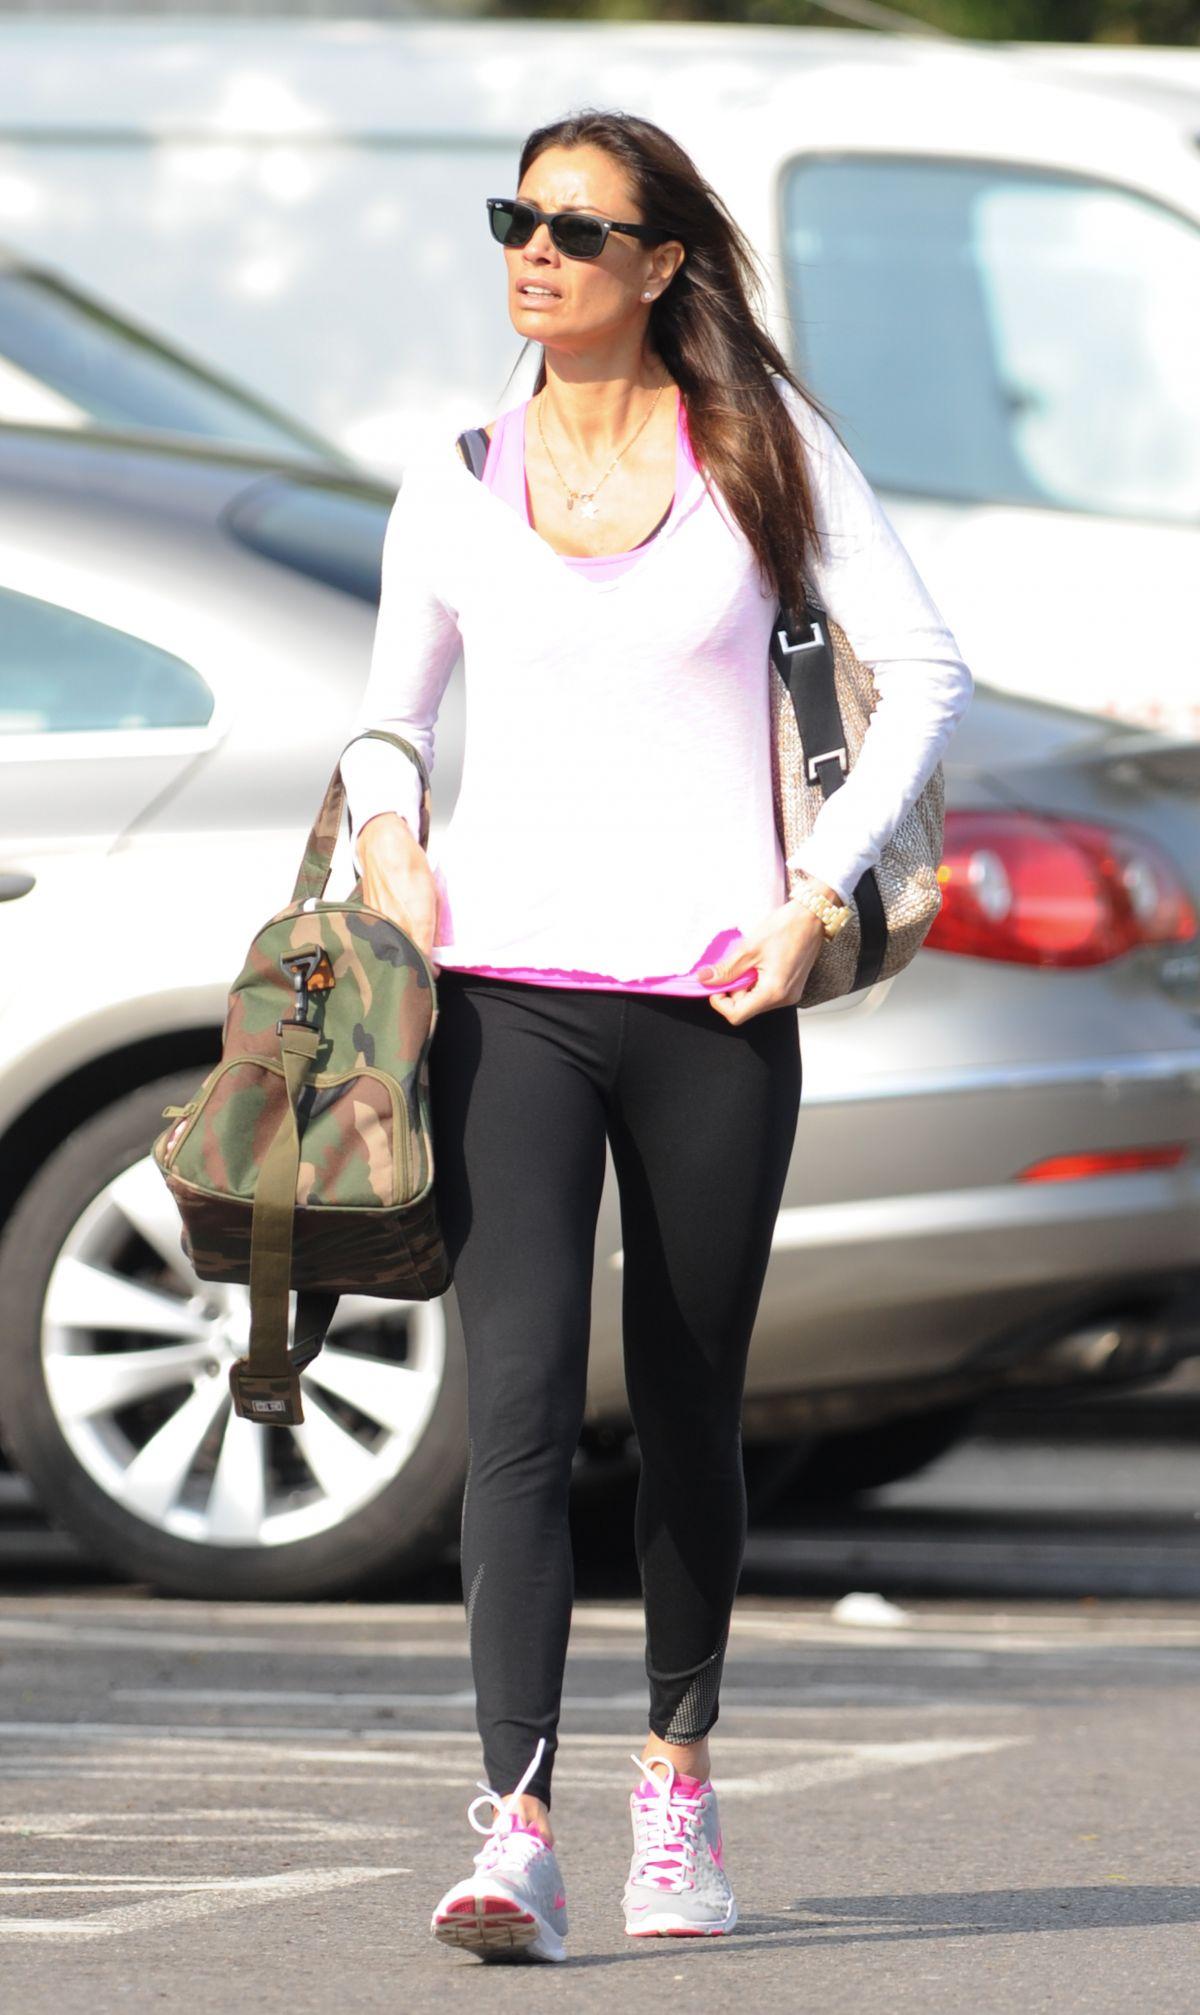 Melanie Sykes Heading To A Gym In London Hawtcelebs